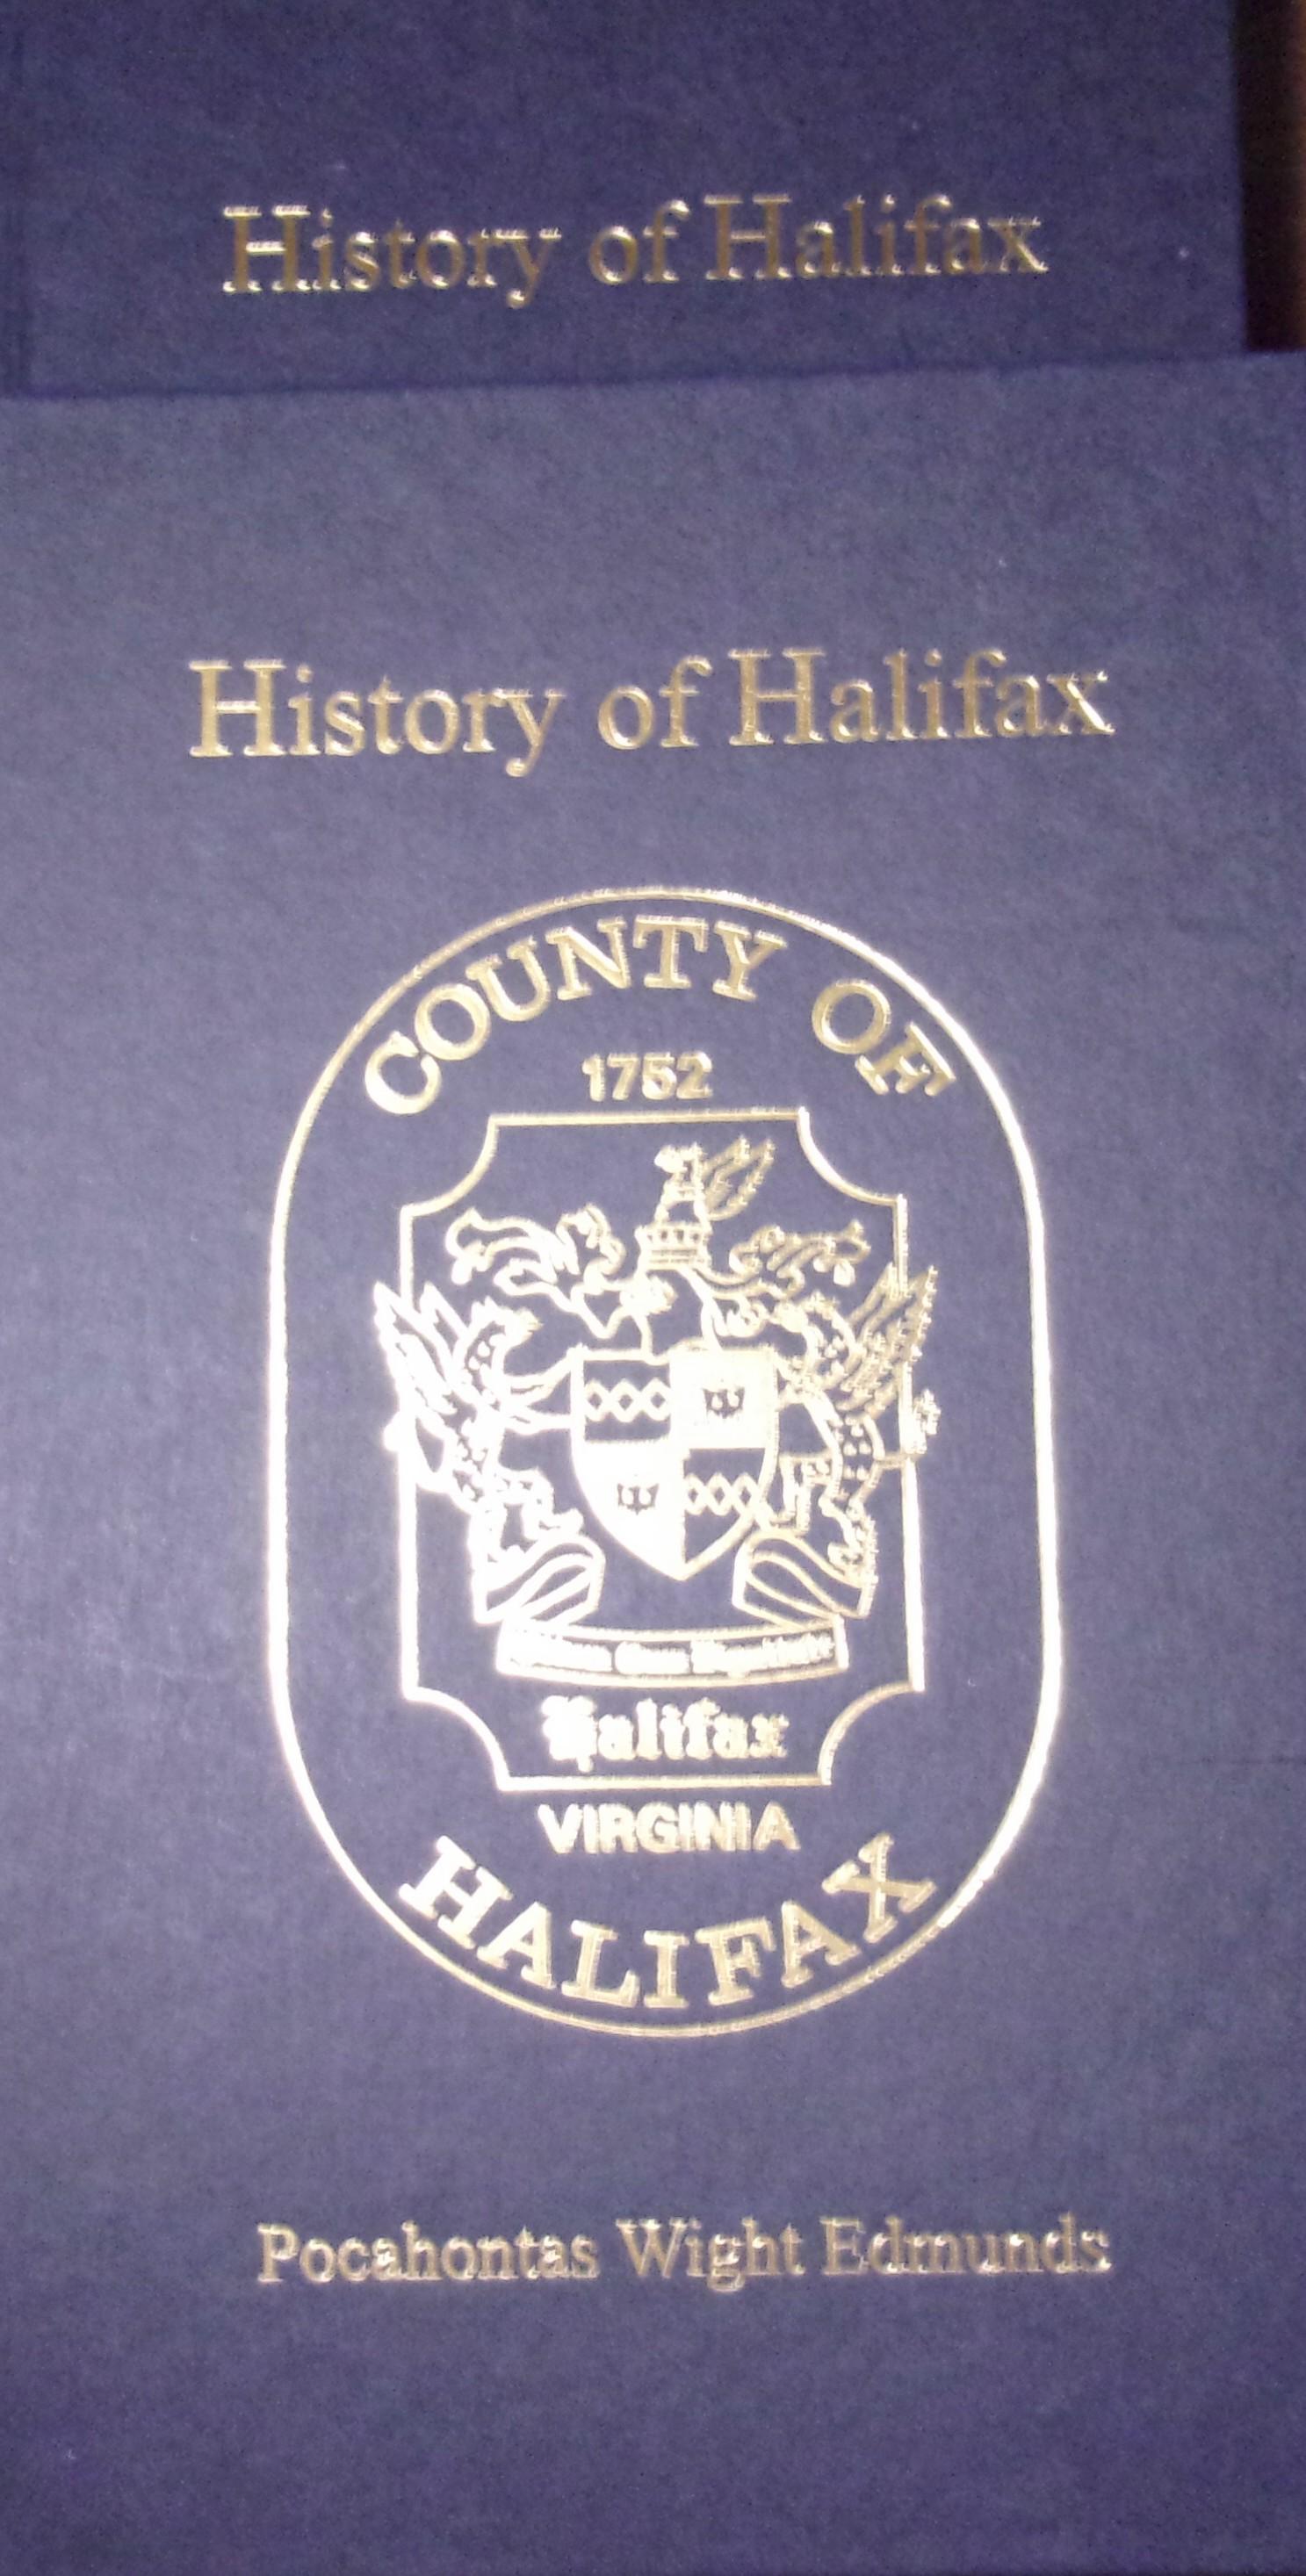 History of Halifax (2 Volume Set).jpg